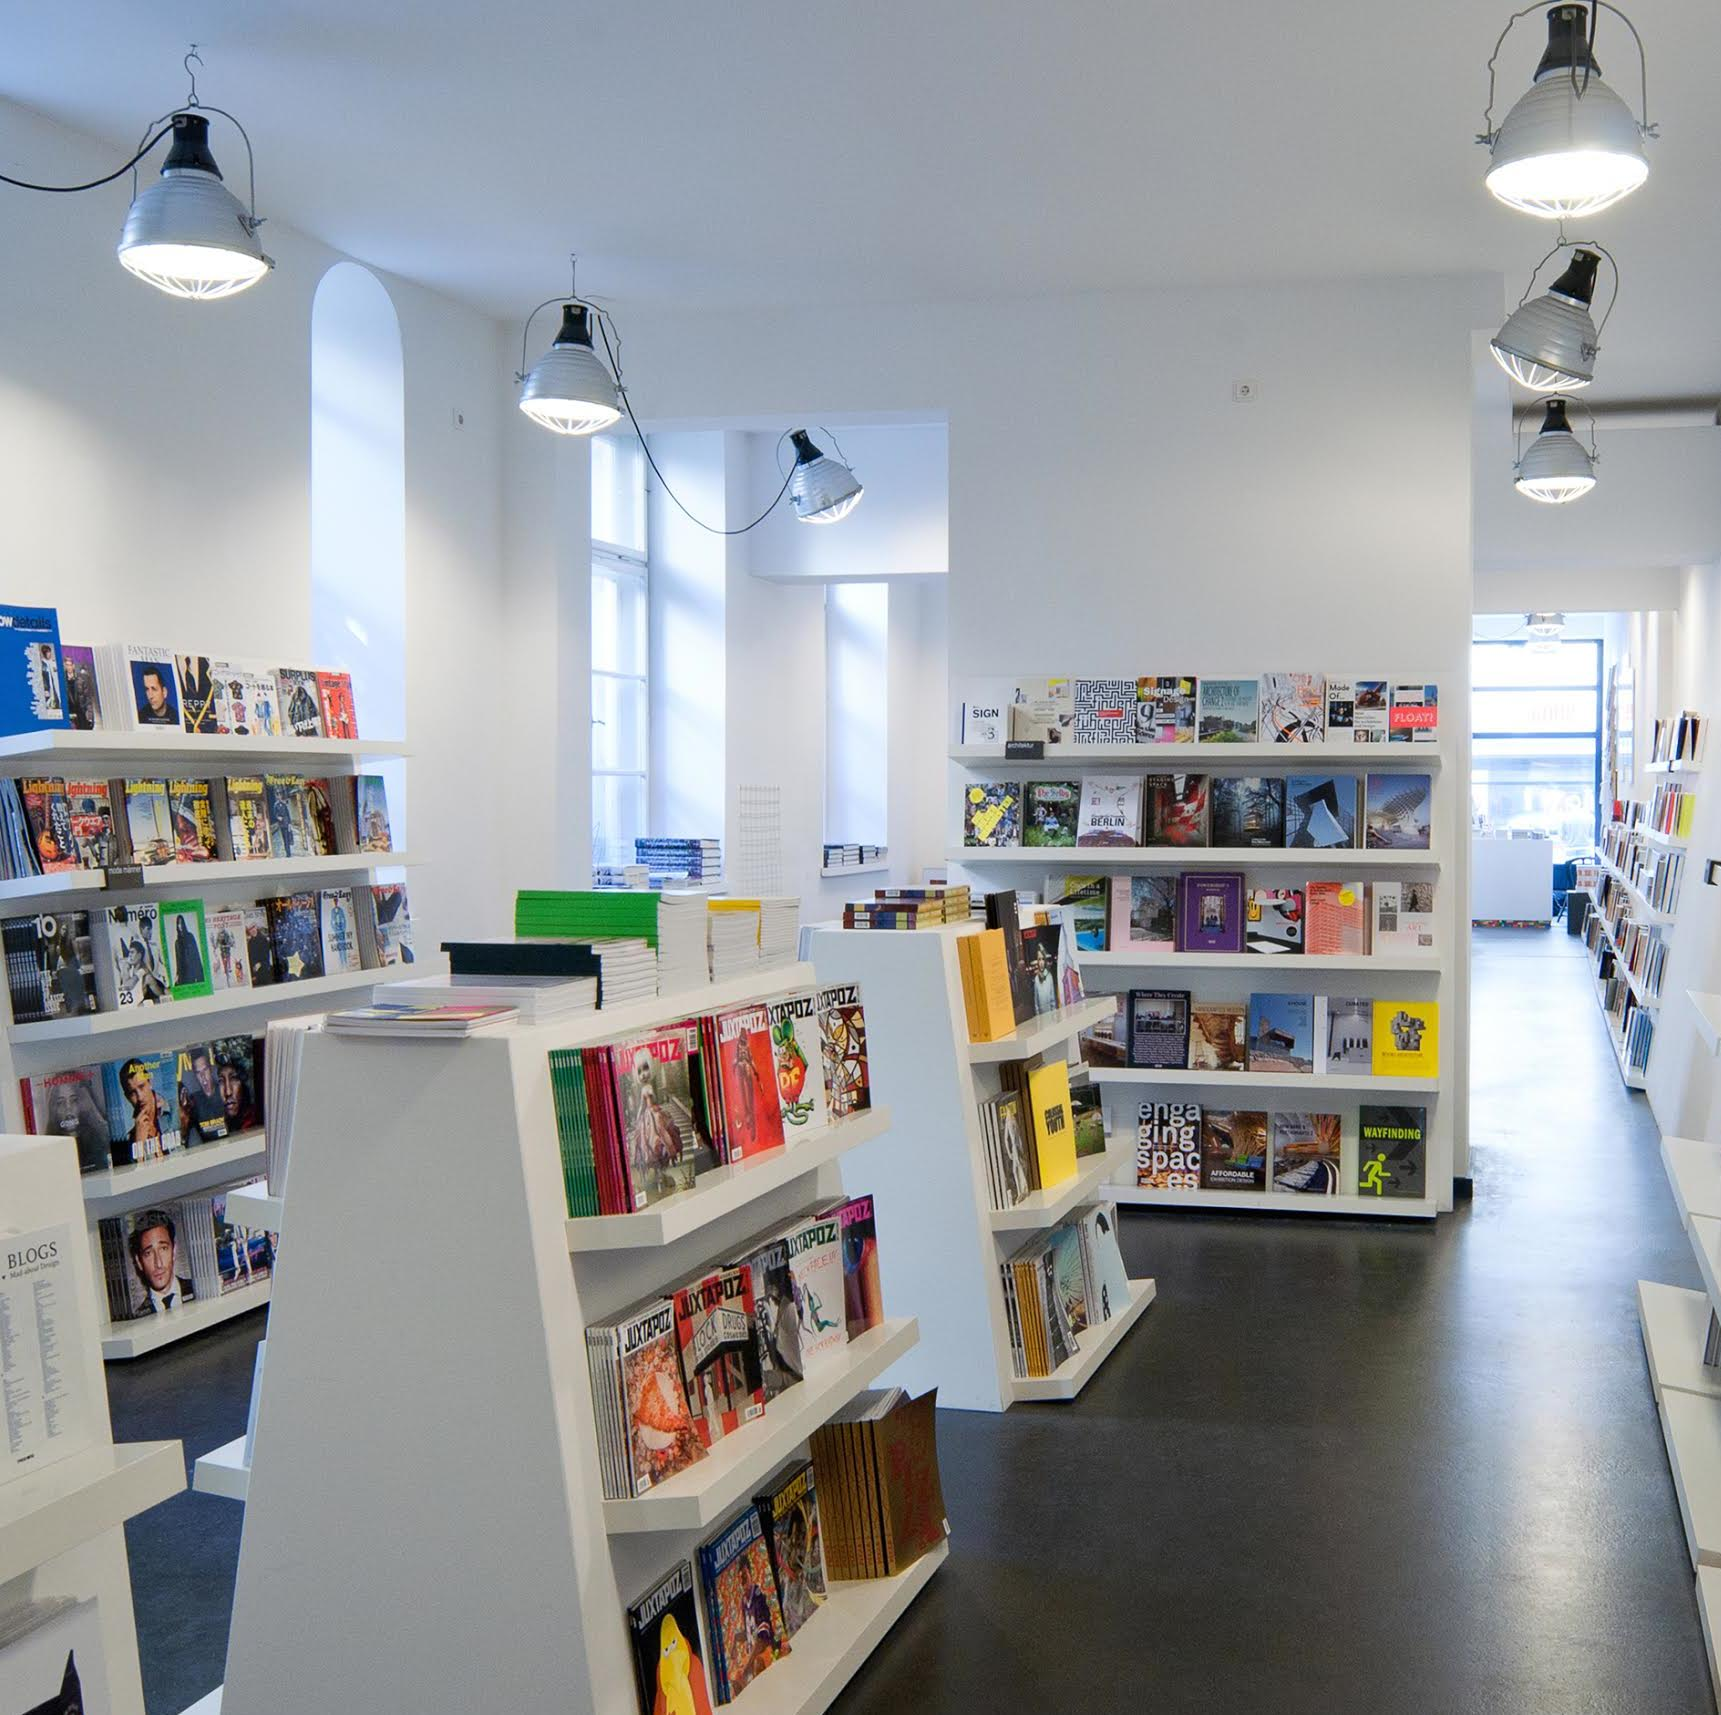 Soda Books München Lehel - Buchladen